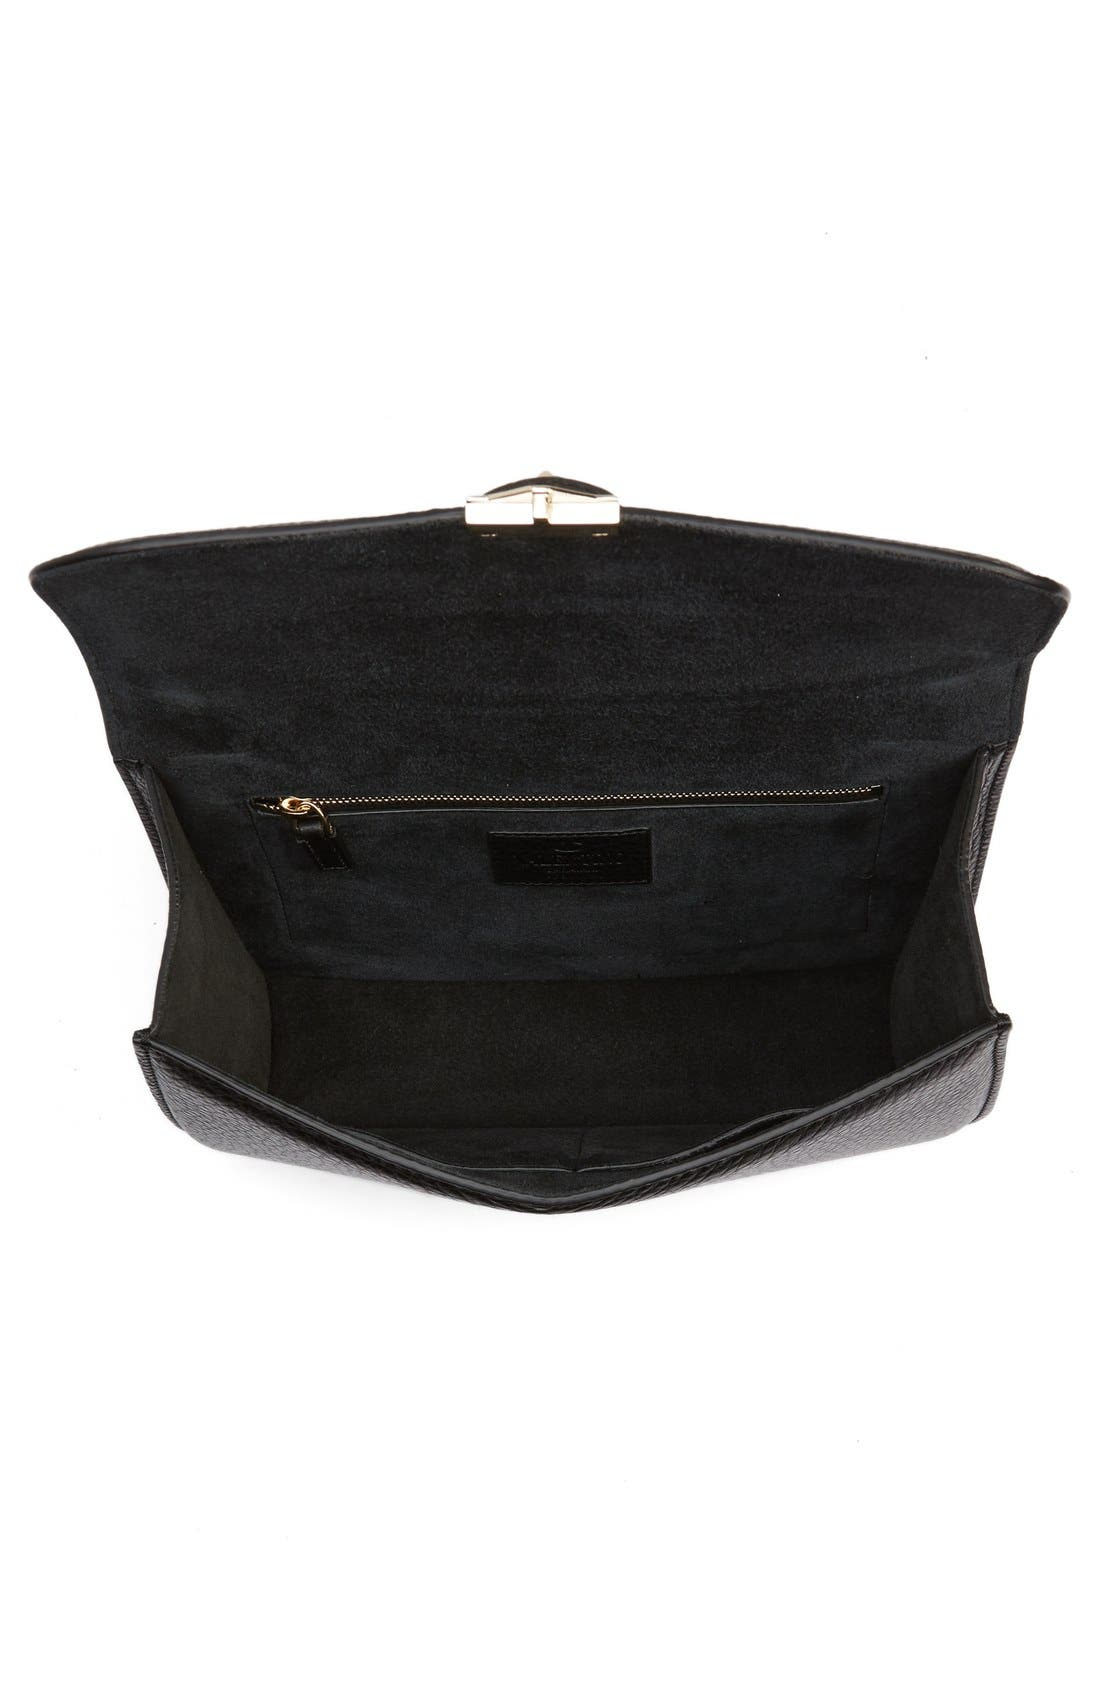 Medium Lock Studded Leather Shoulder Bag,                             Alternate thumbnail 2, color,                             NERO